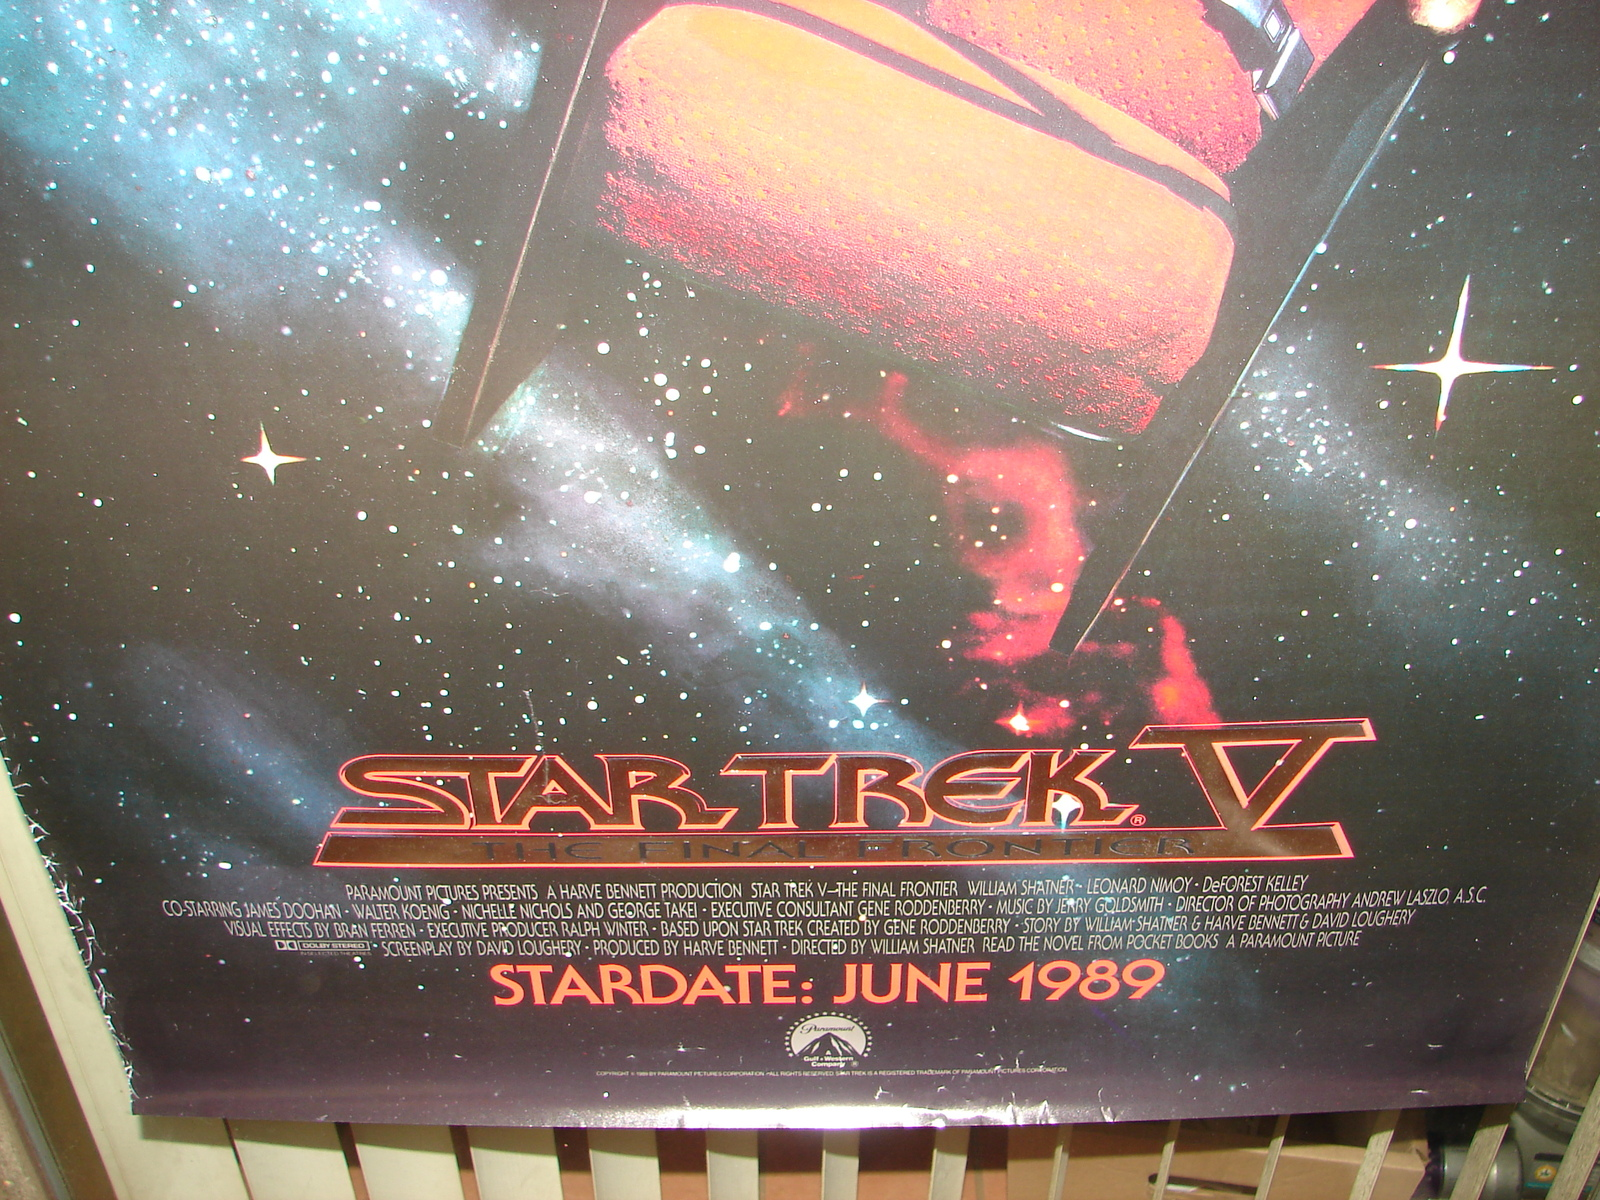 1989 STAR TREK V Advance Movie POSTER 27x40 Original Vintage 1-Sided Rolled 2